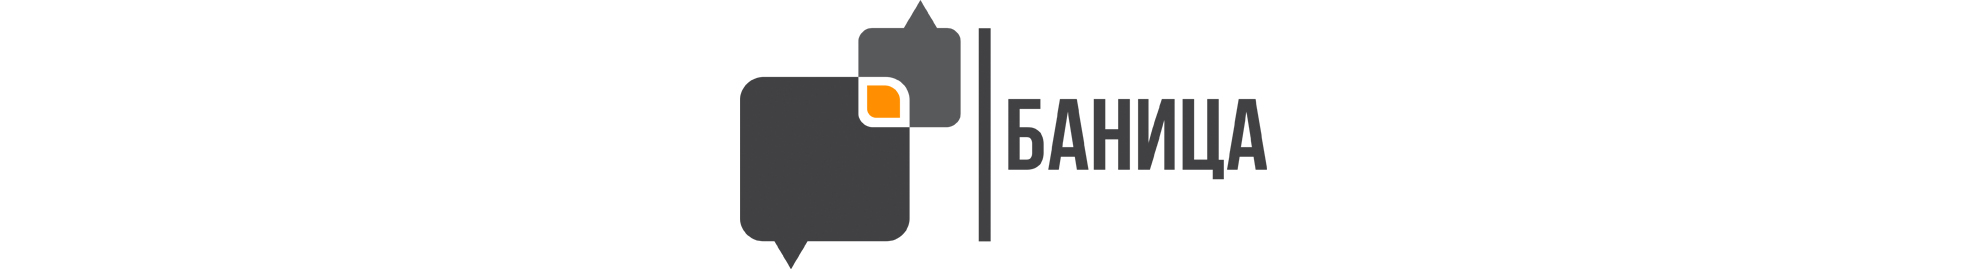 Banitza   Баница   Новини, Общество, Политика и Диалог.